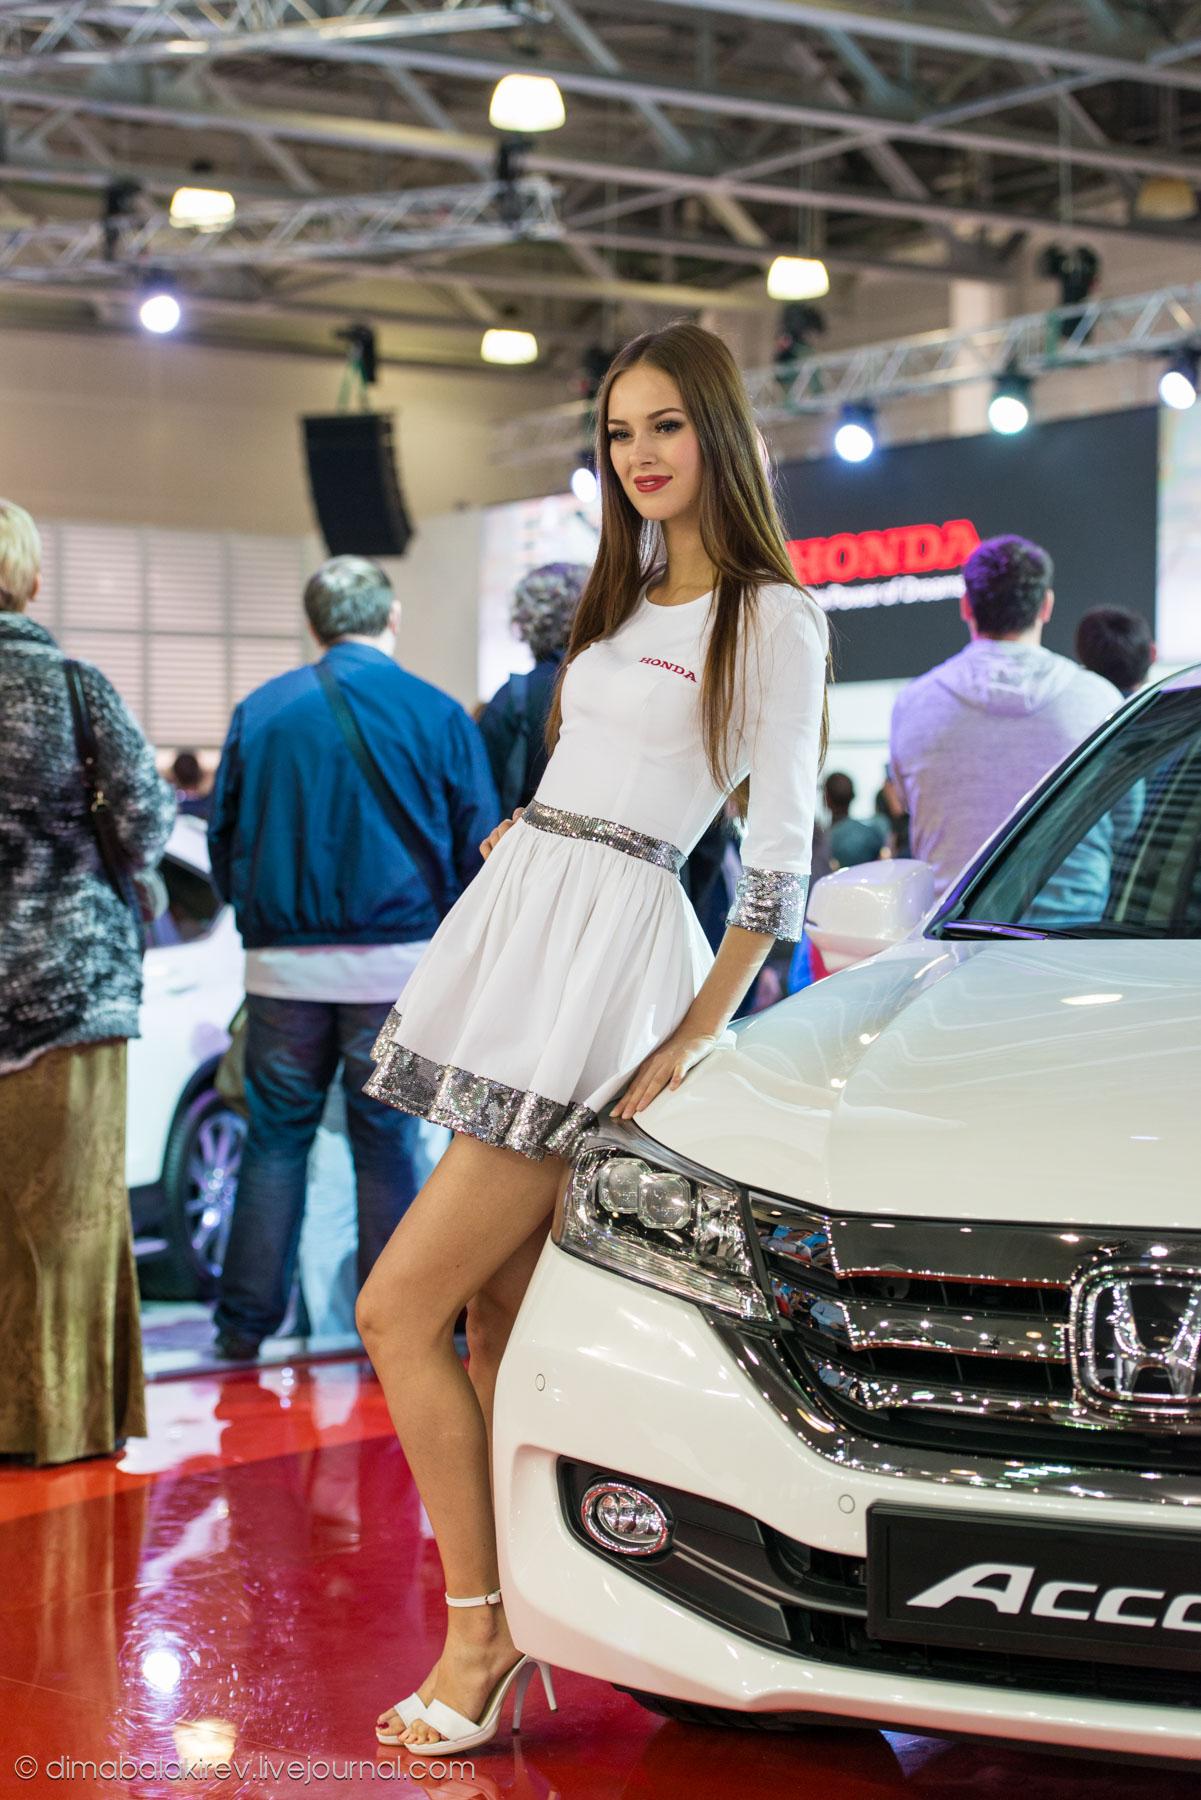 MMAC-2014 – Московский международный автосалон